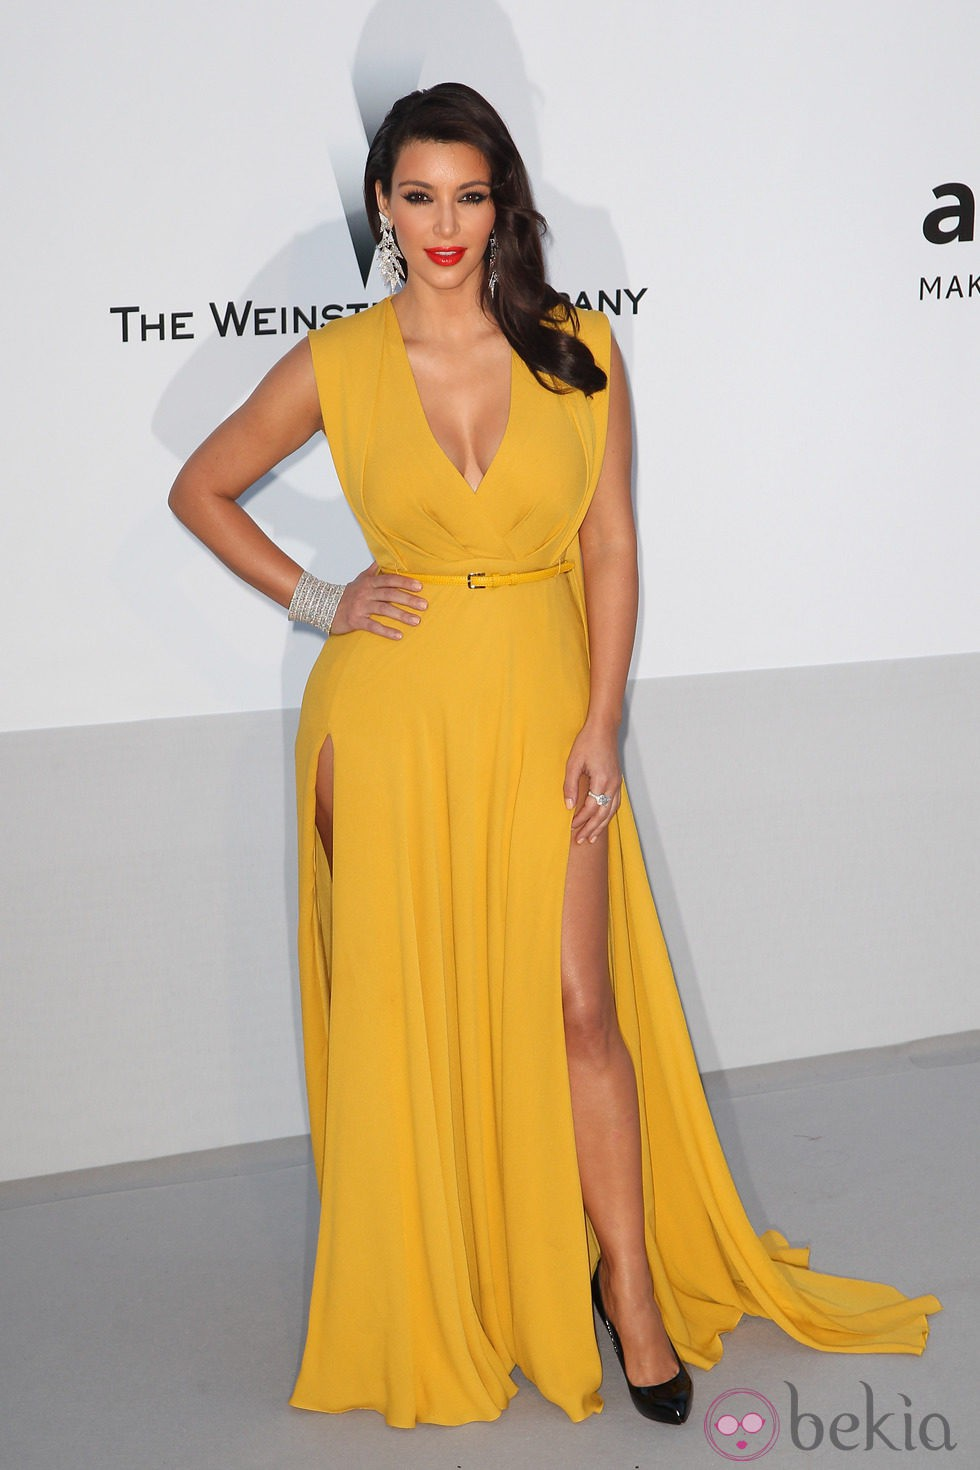 Kim Kardashian en la gala amfAR celebrada en el Festival de Cannes 2012